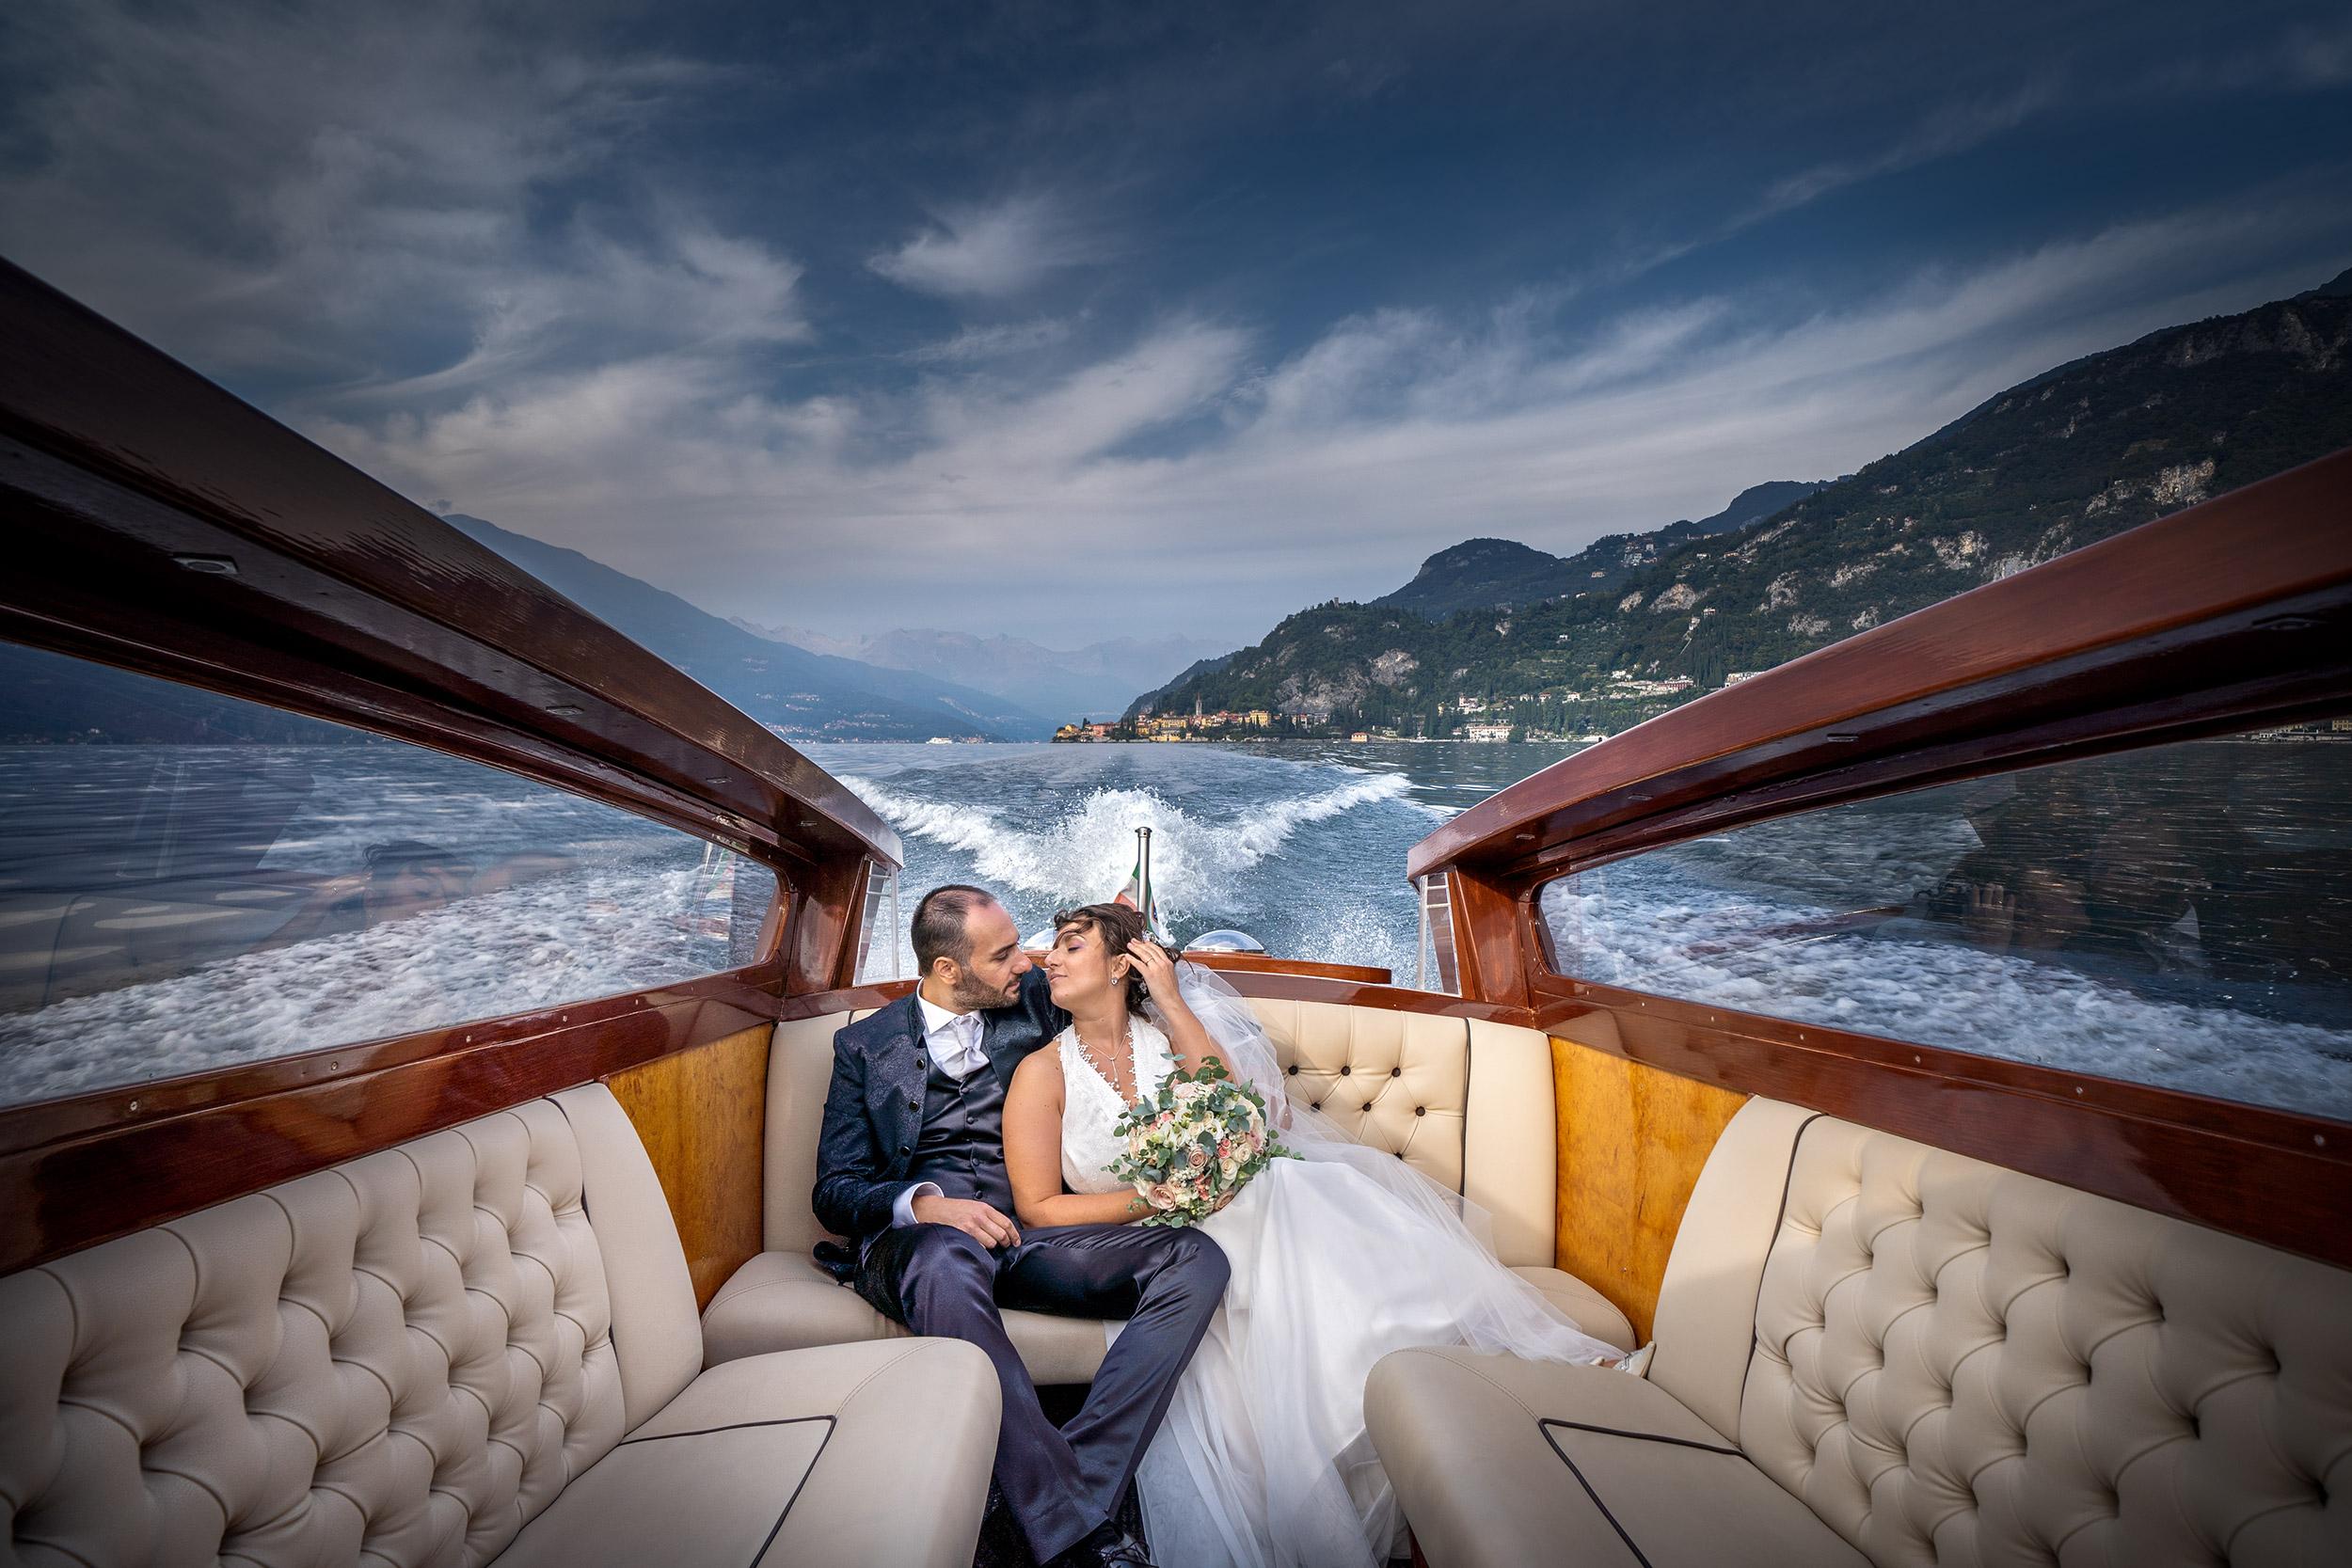 000 reportage sposi foto matrimonio wedding bellagio lago como copia 1